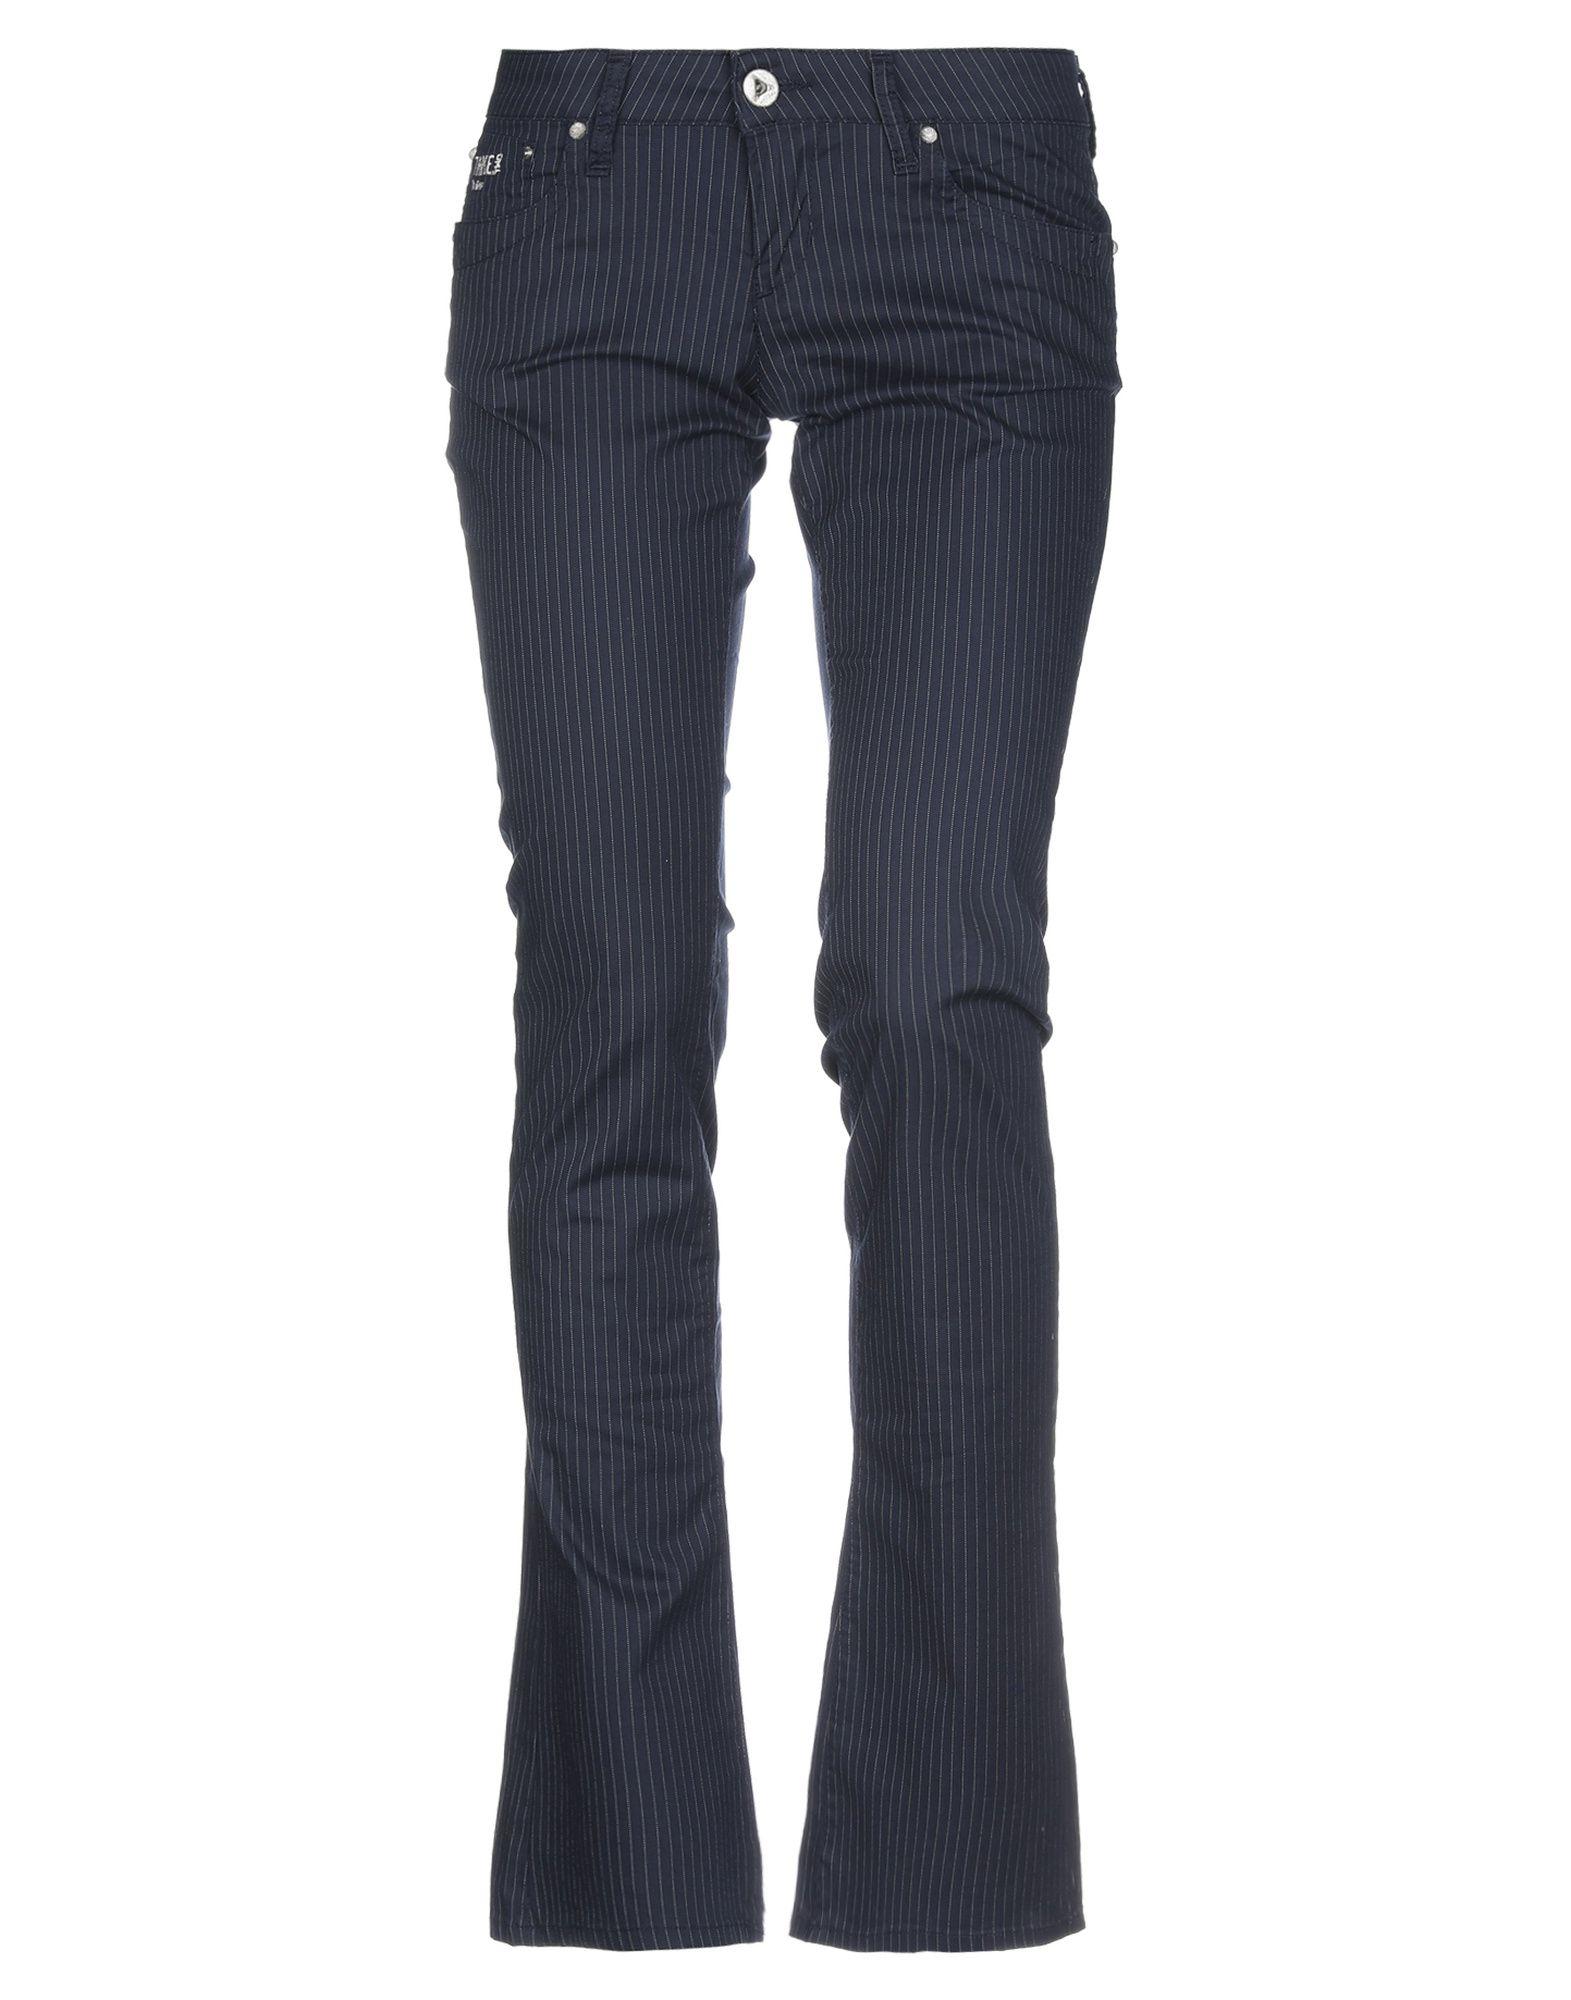 все цены на TAKE-TWO Повседневные брюки онлайн